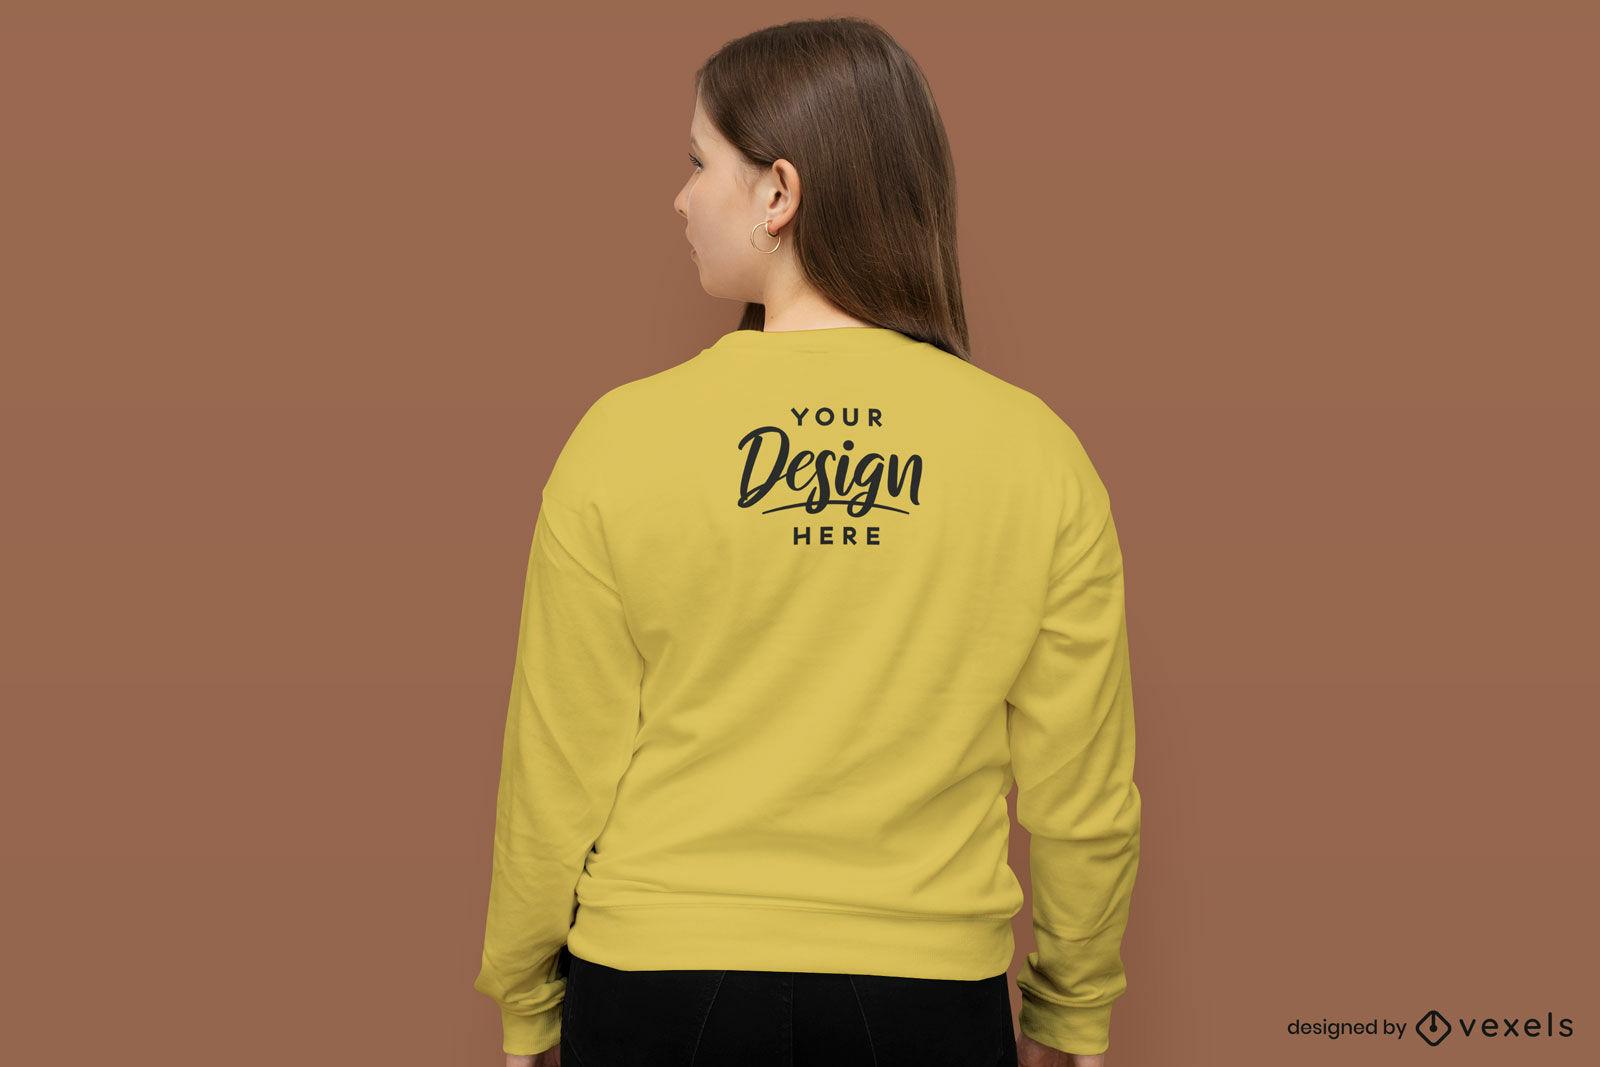 Chica en sudadera con maqueta de fondo yellowe